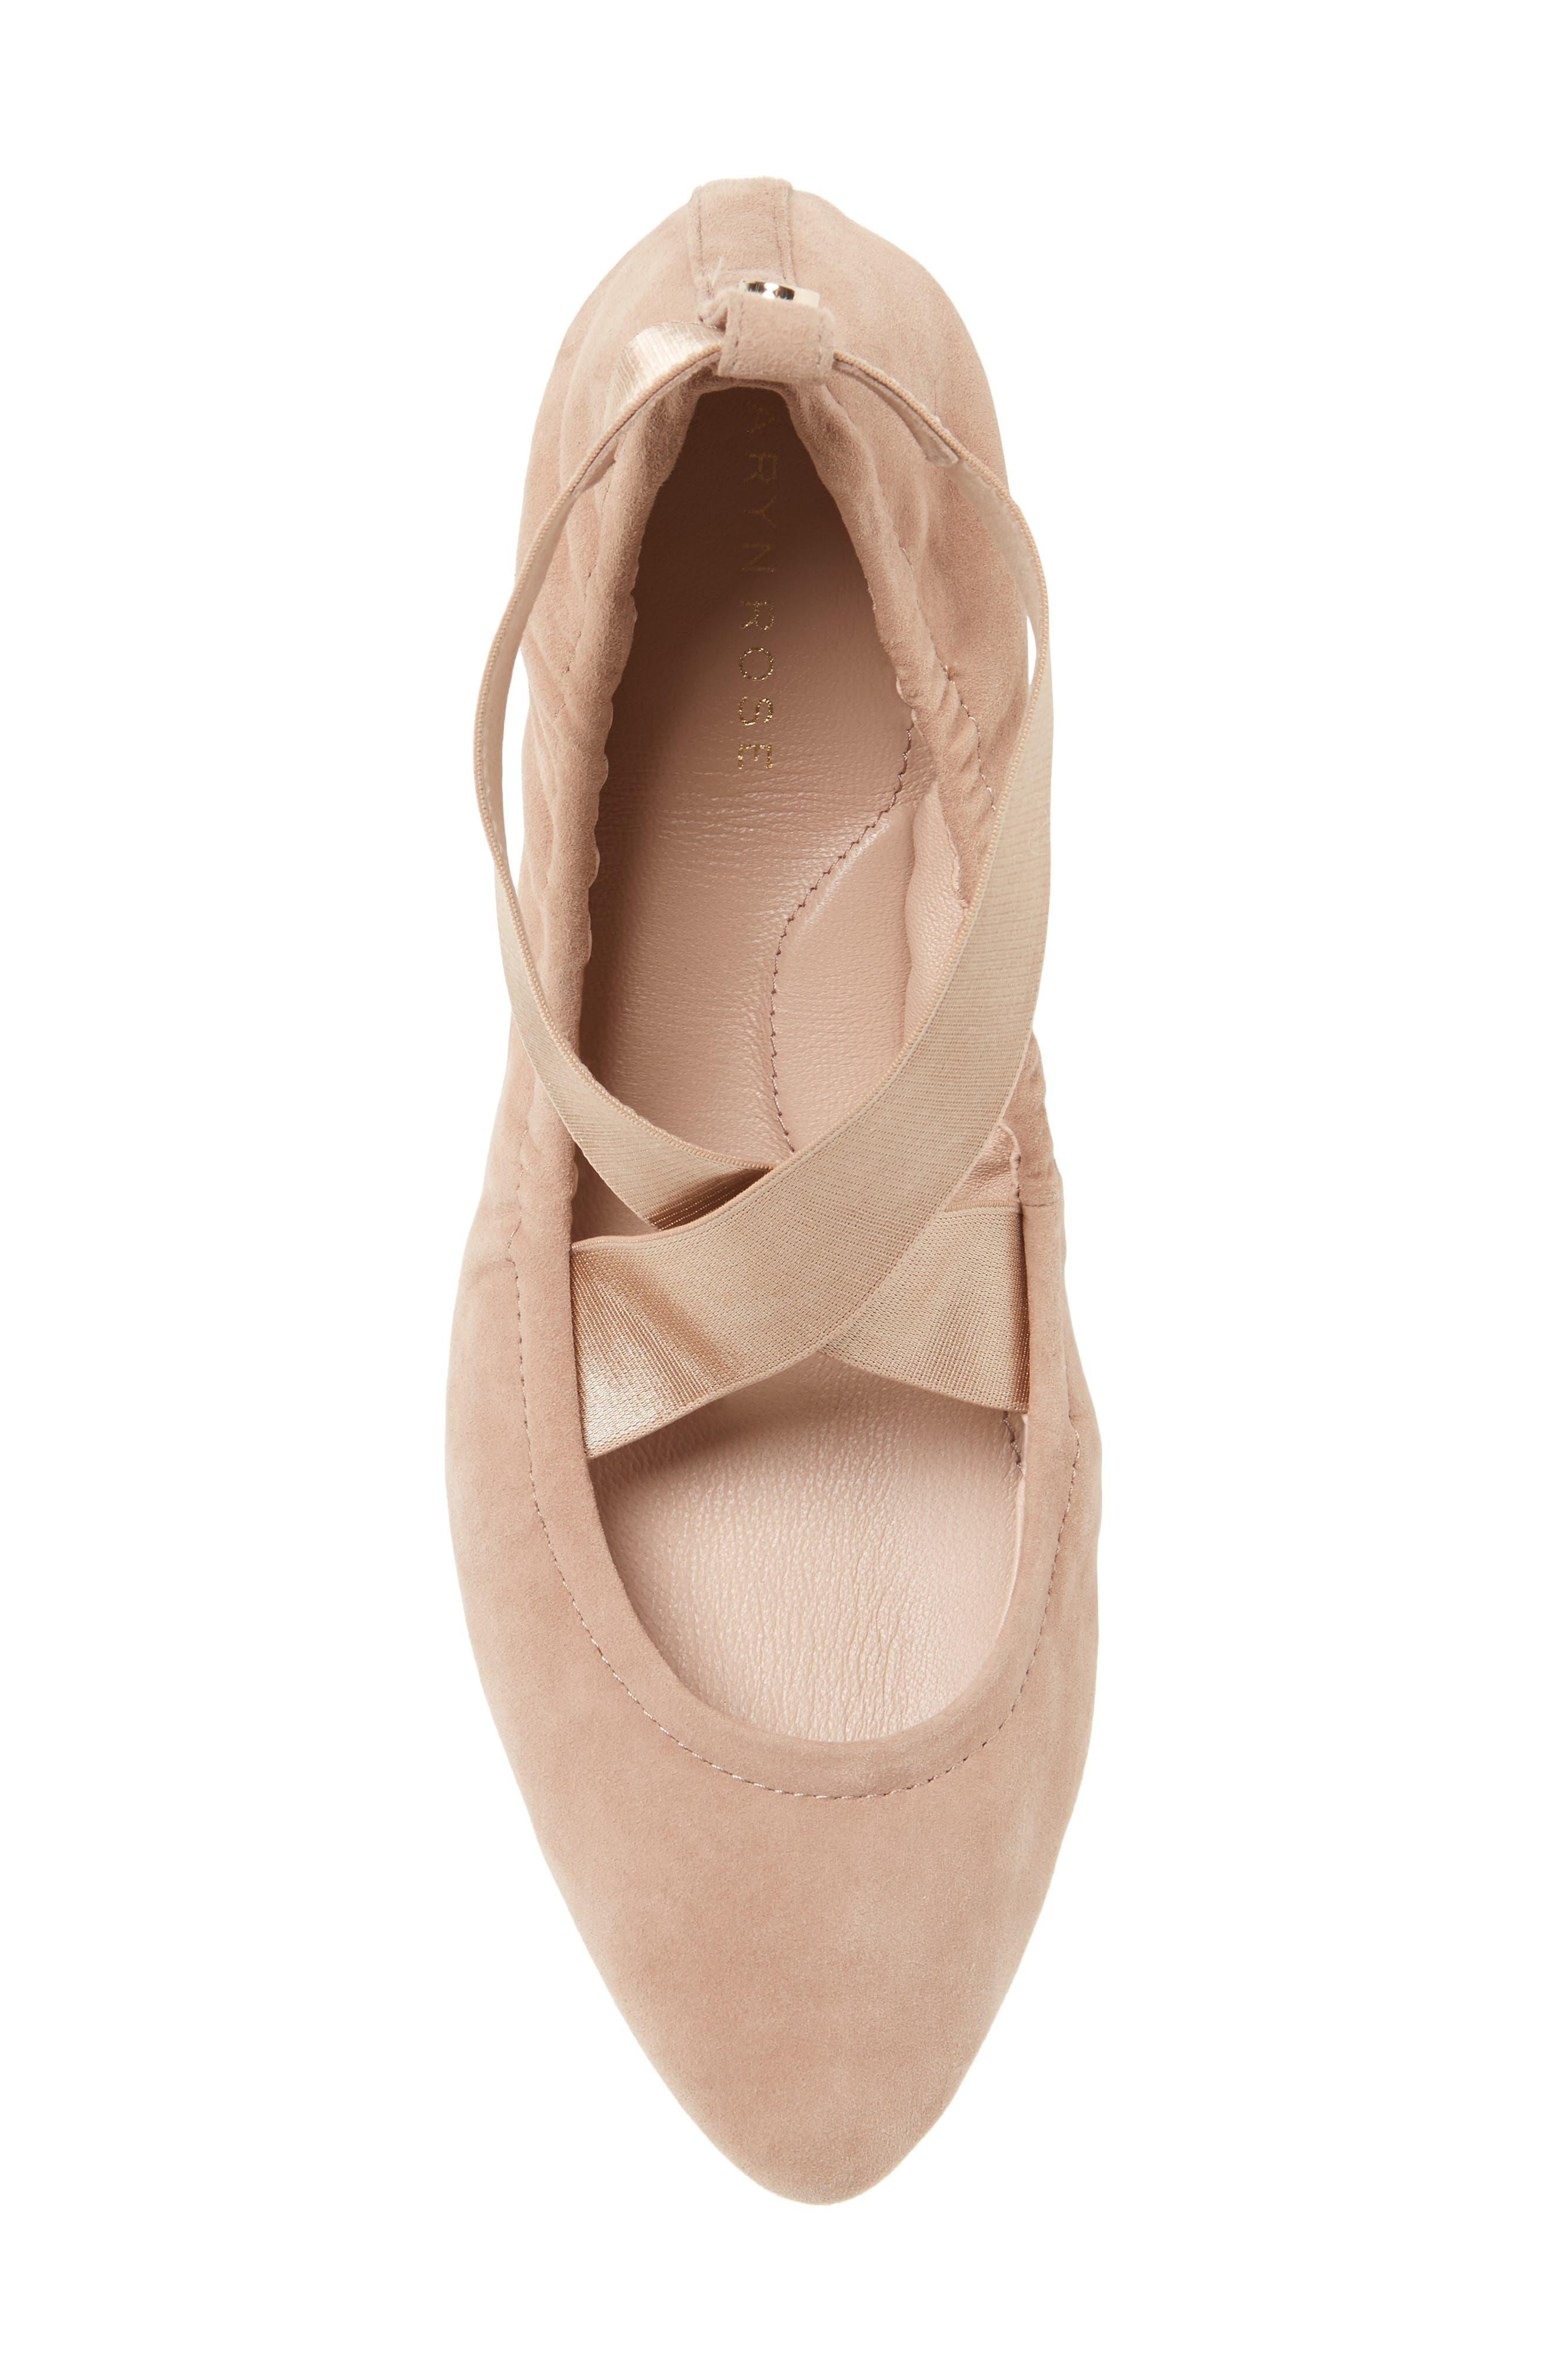 Edina Strappy Ballet Flat,                             Alternate thumbnail 5, color,                             Soft Beige Suede